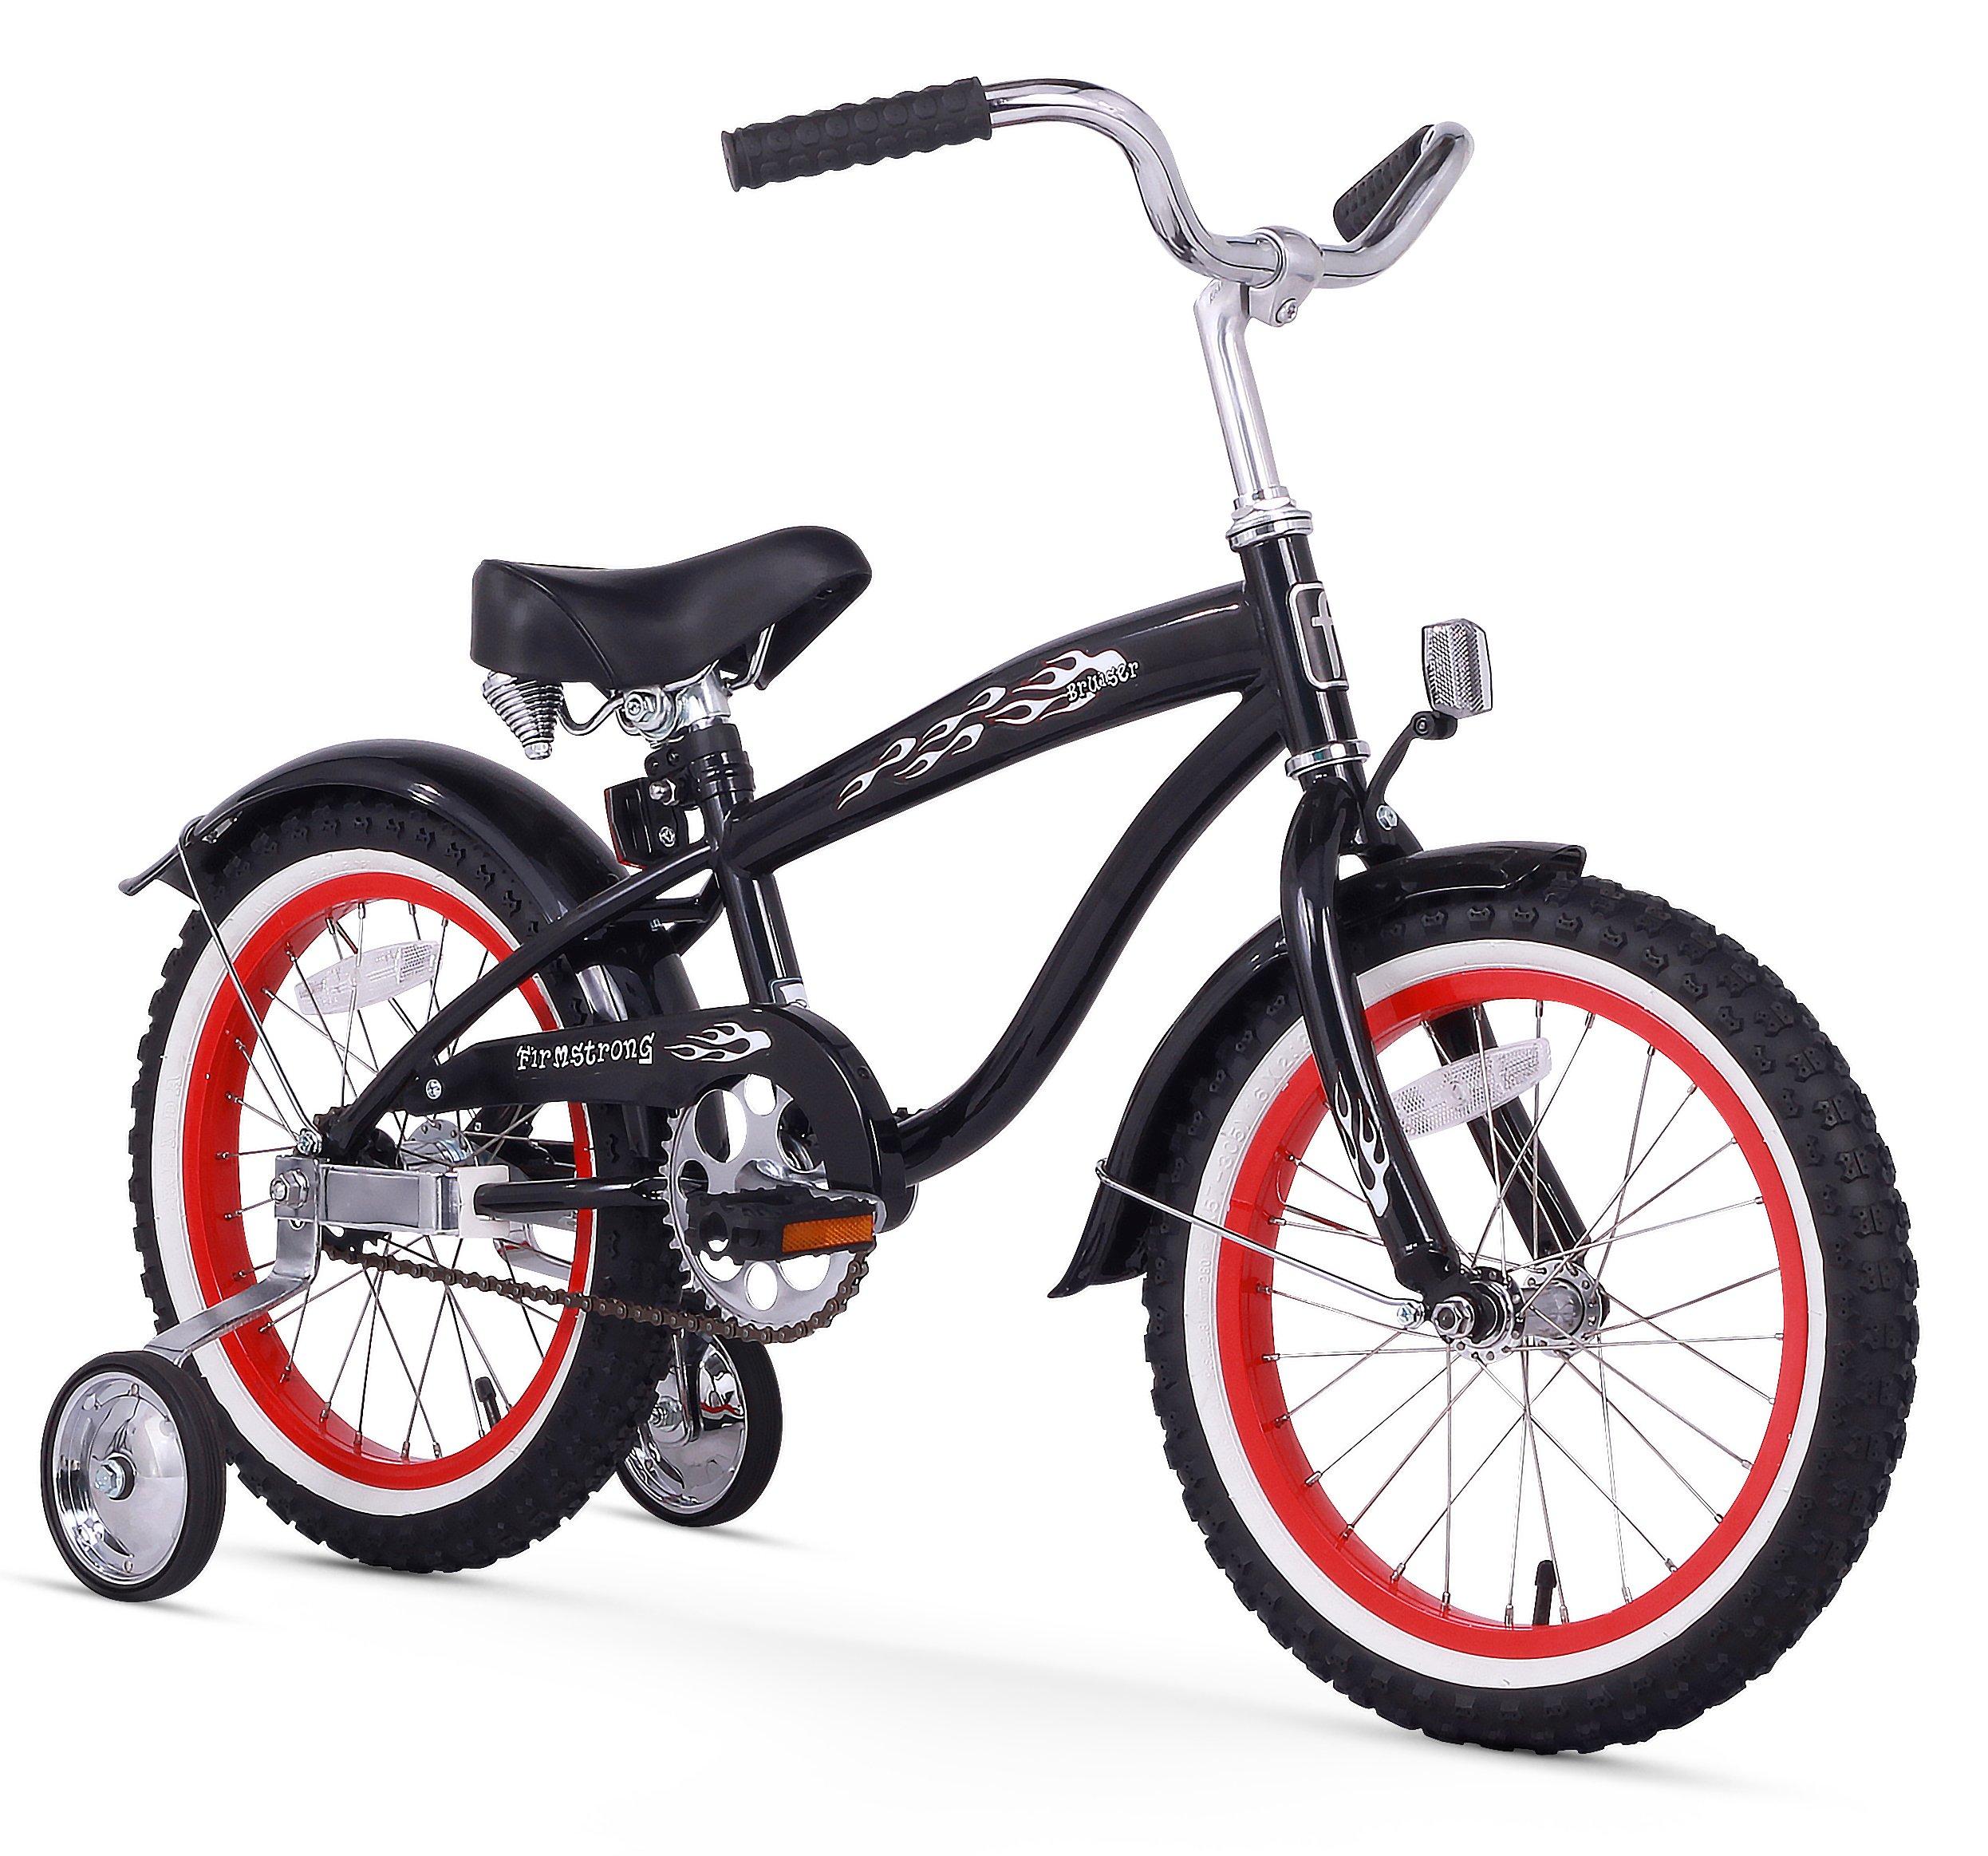 Firmstrong Mini Bruiser 16 Single Speed Beach Cruiser Bike